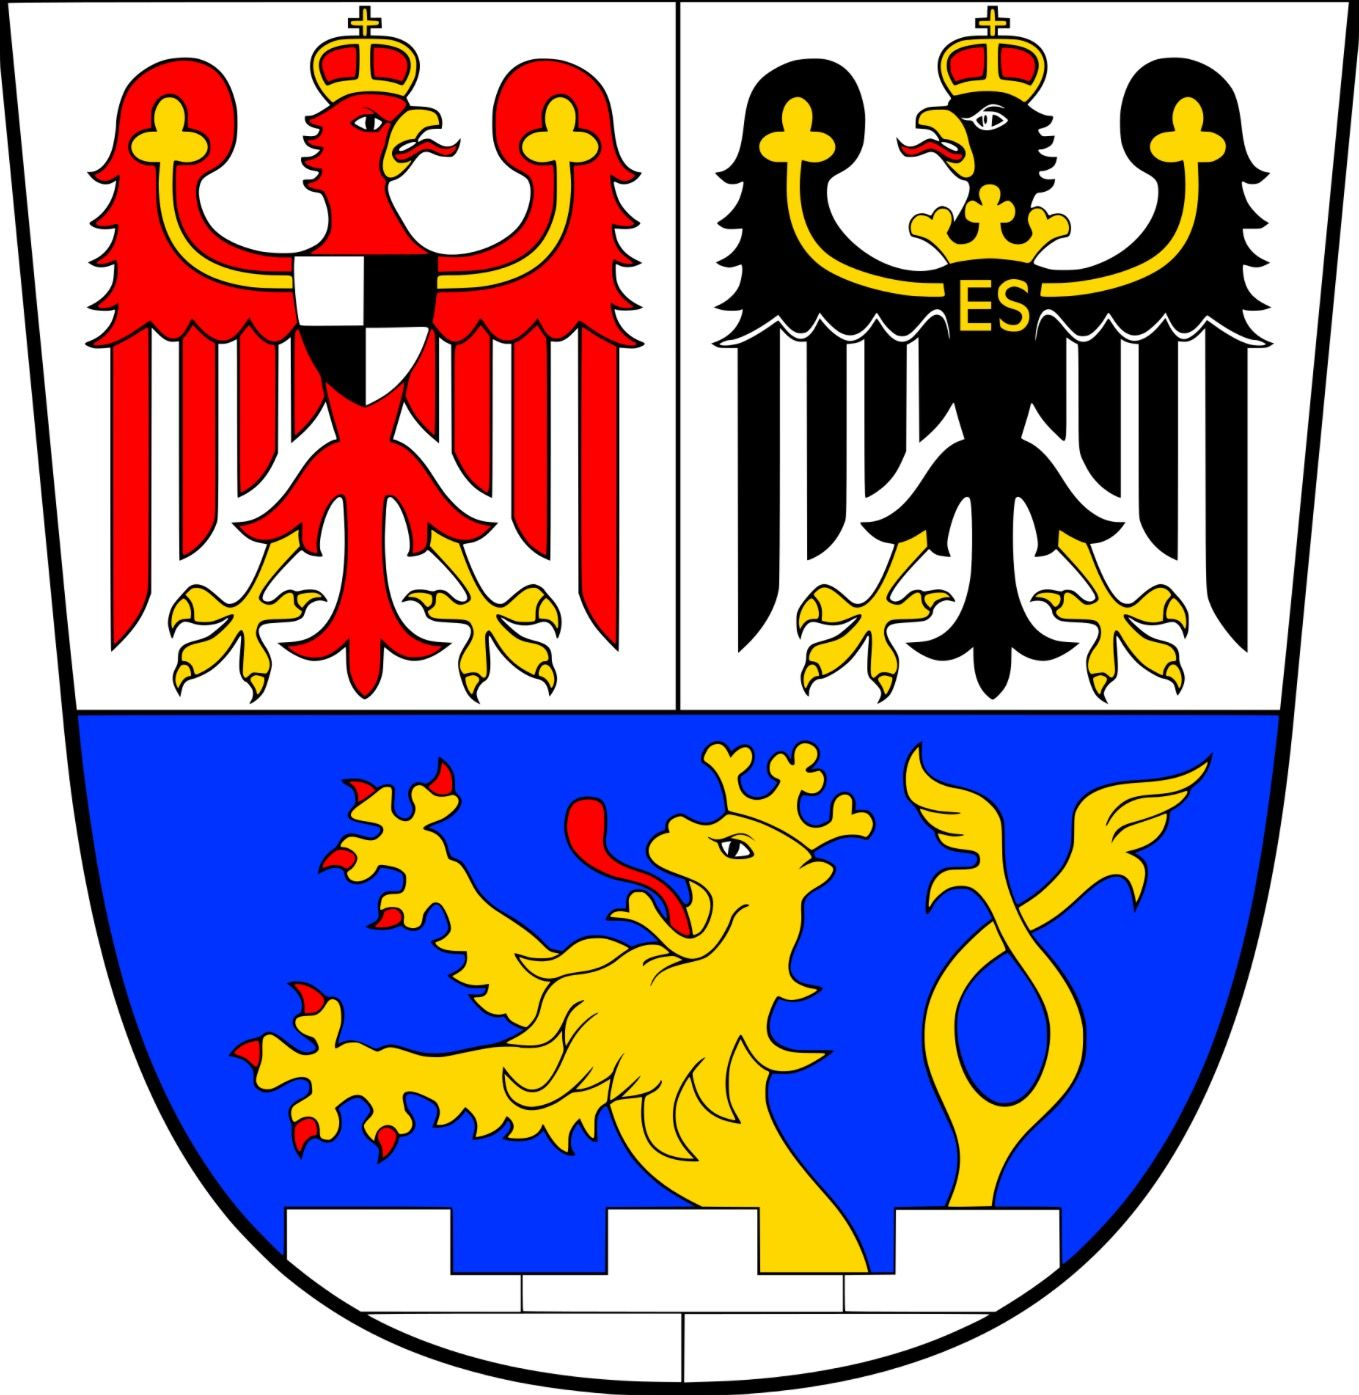 Erlangen 🇩🇪 | Coat of arms, Arms, Wall art canvas prints